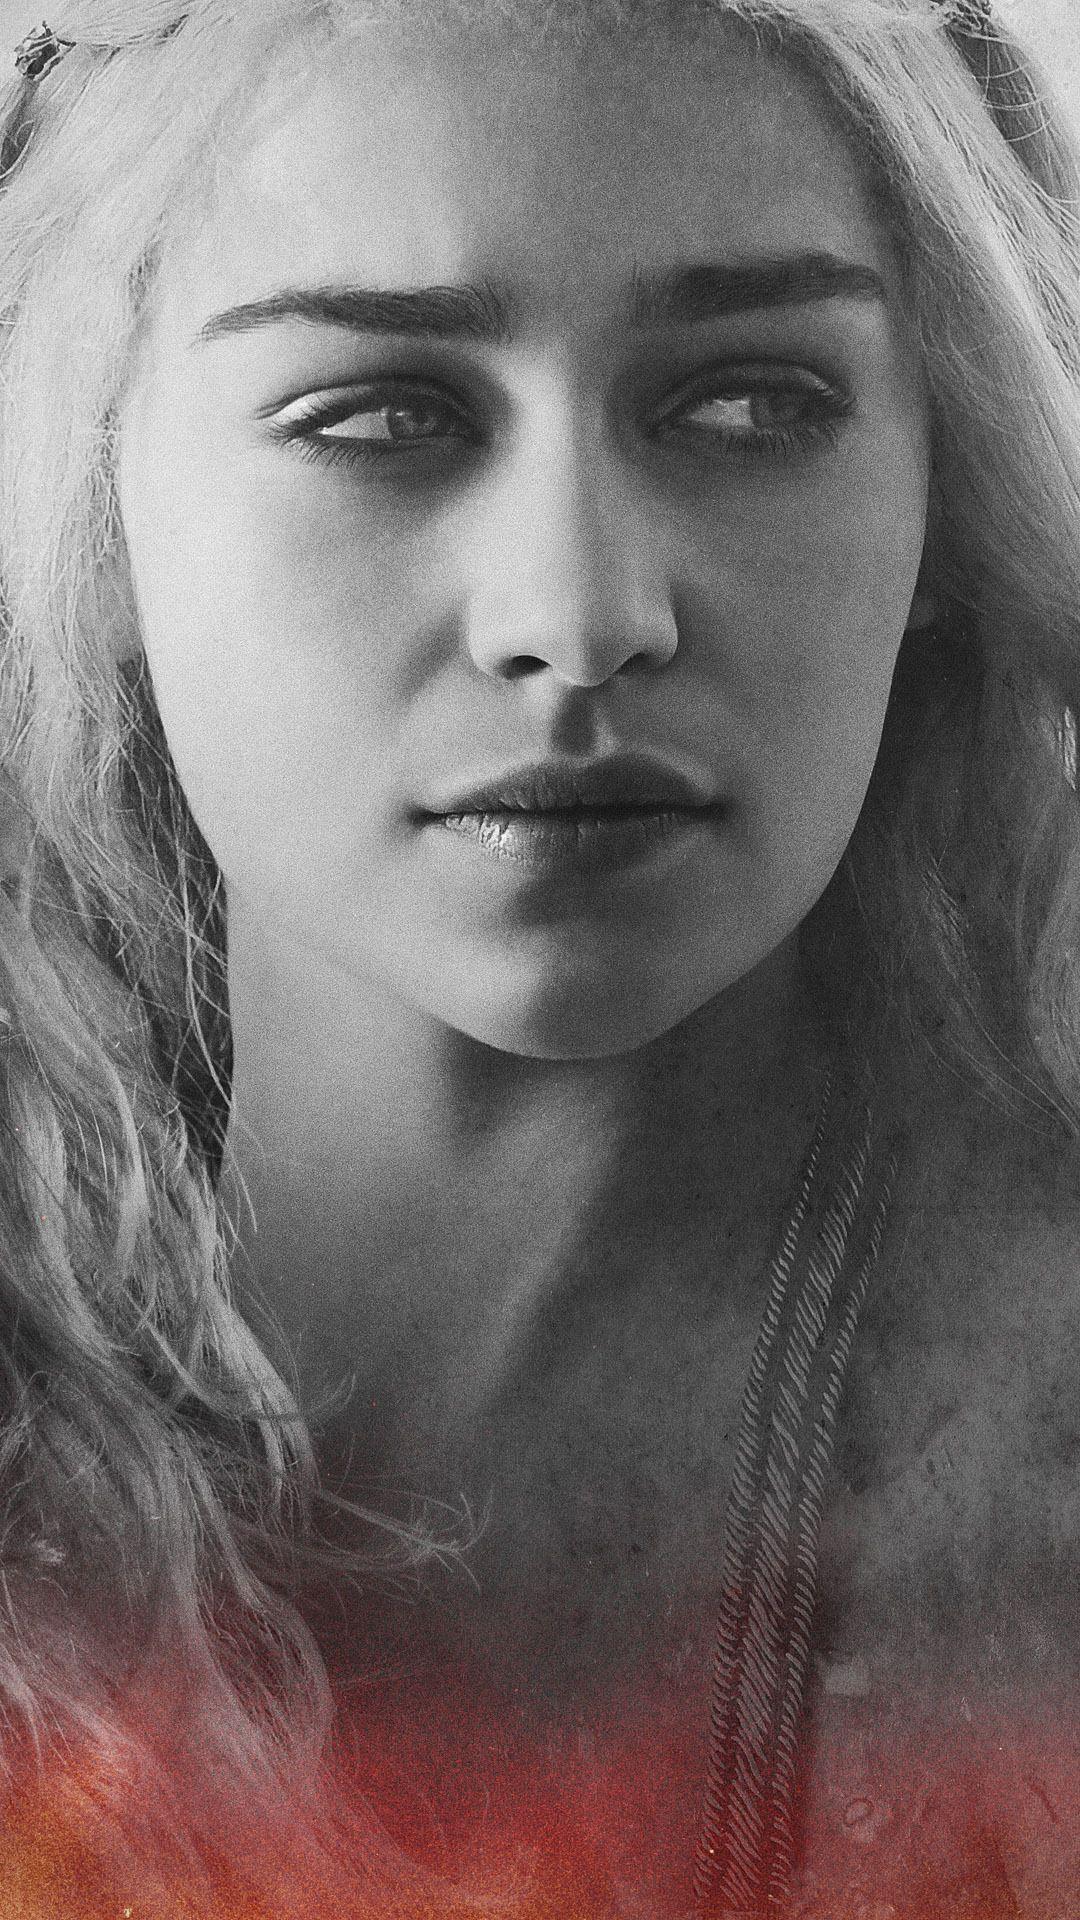 Daenerys Targaryen Game Of Thrones Mobile Wallpaper 13928